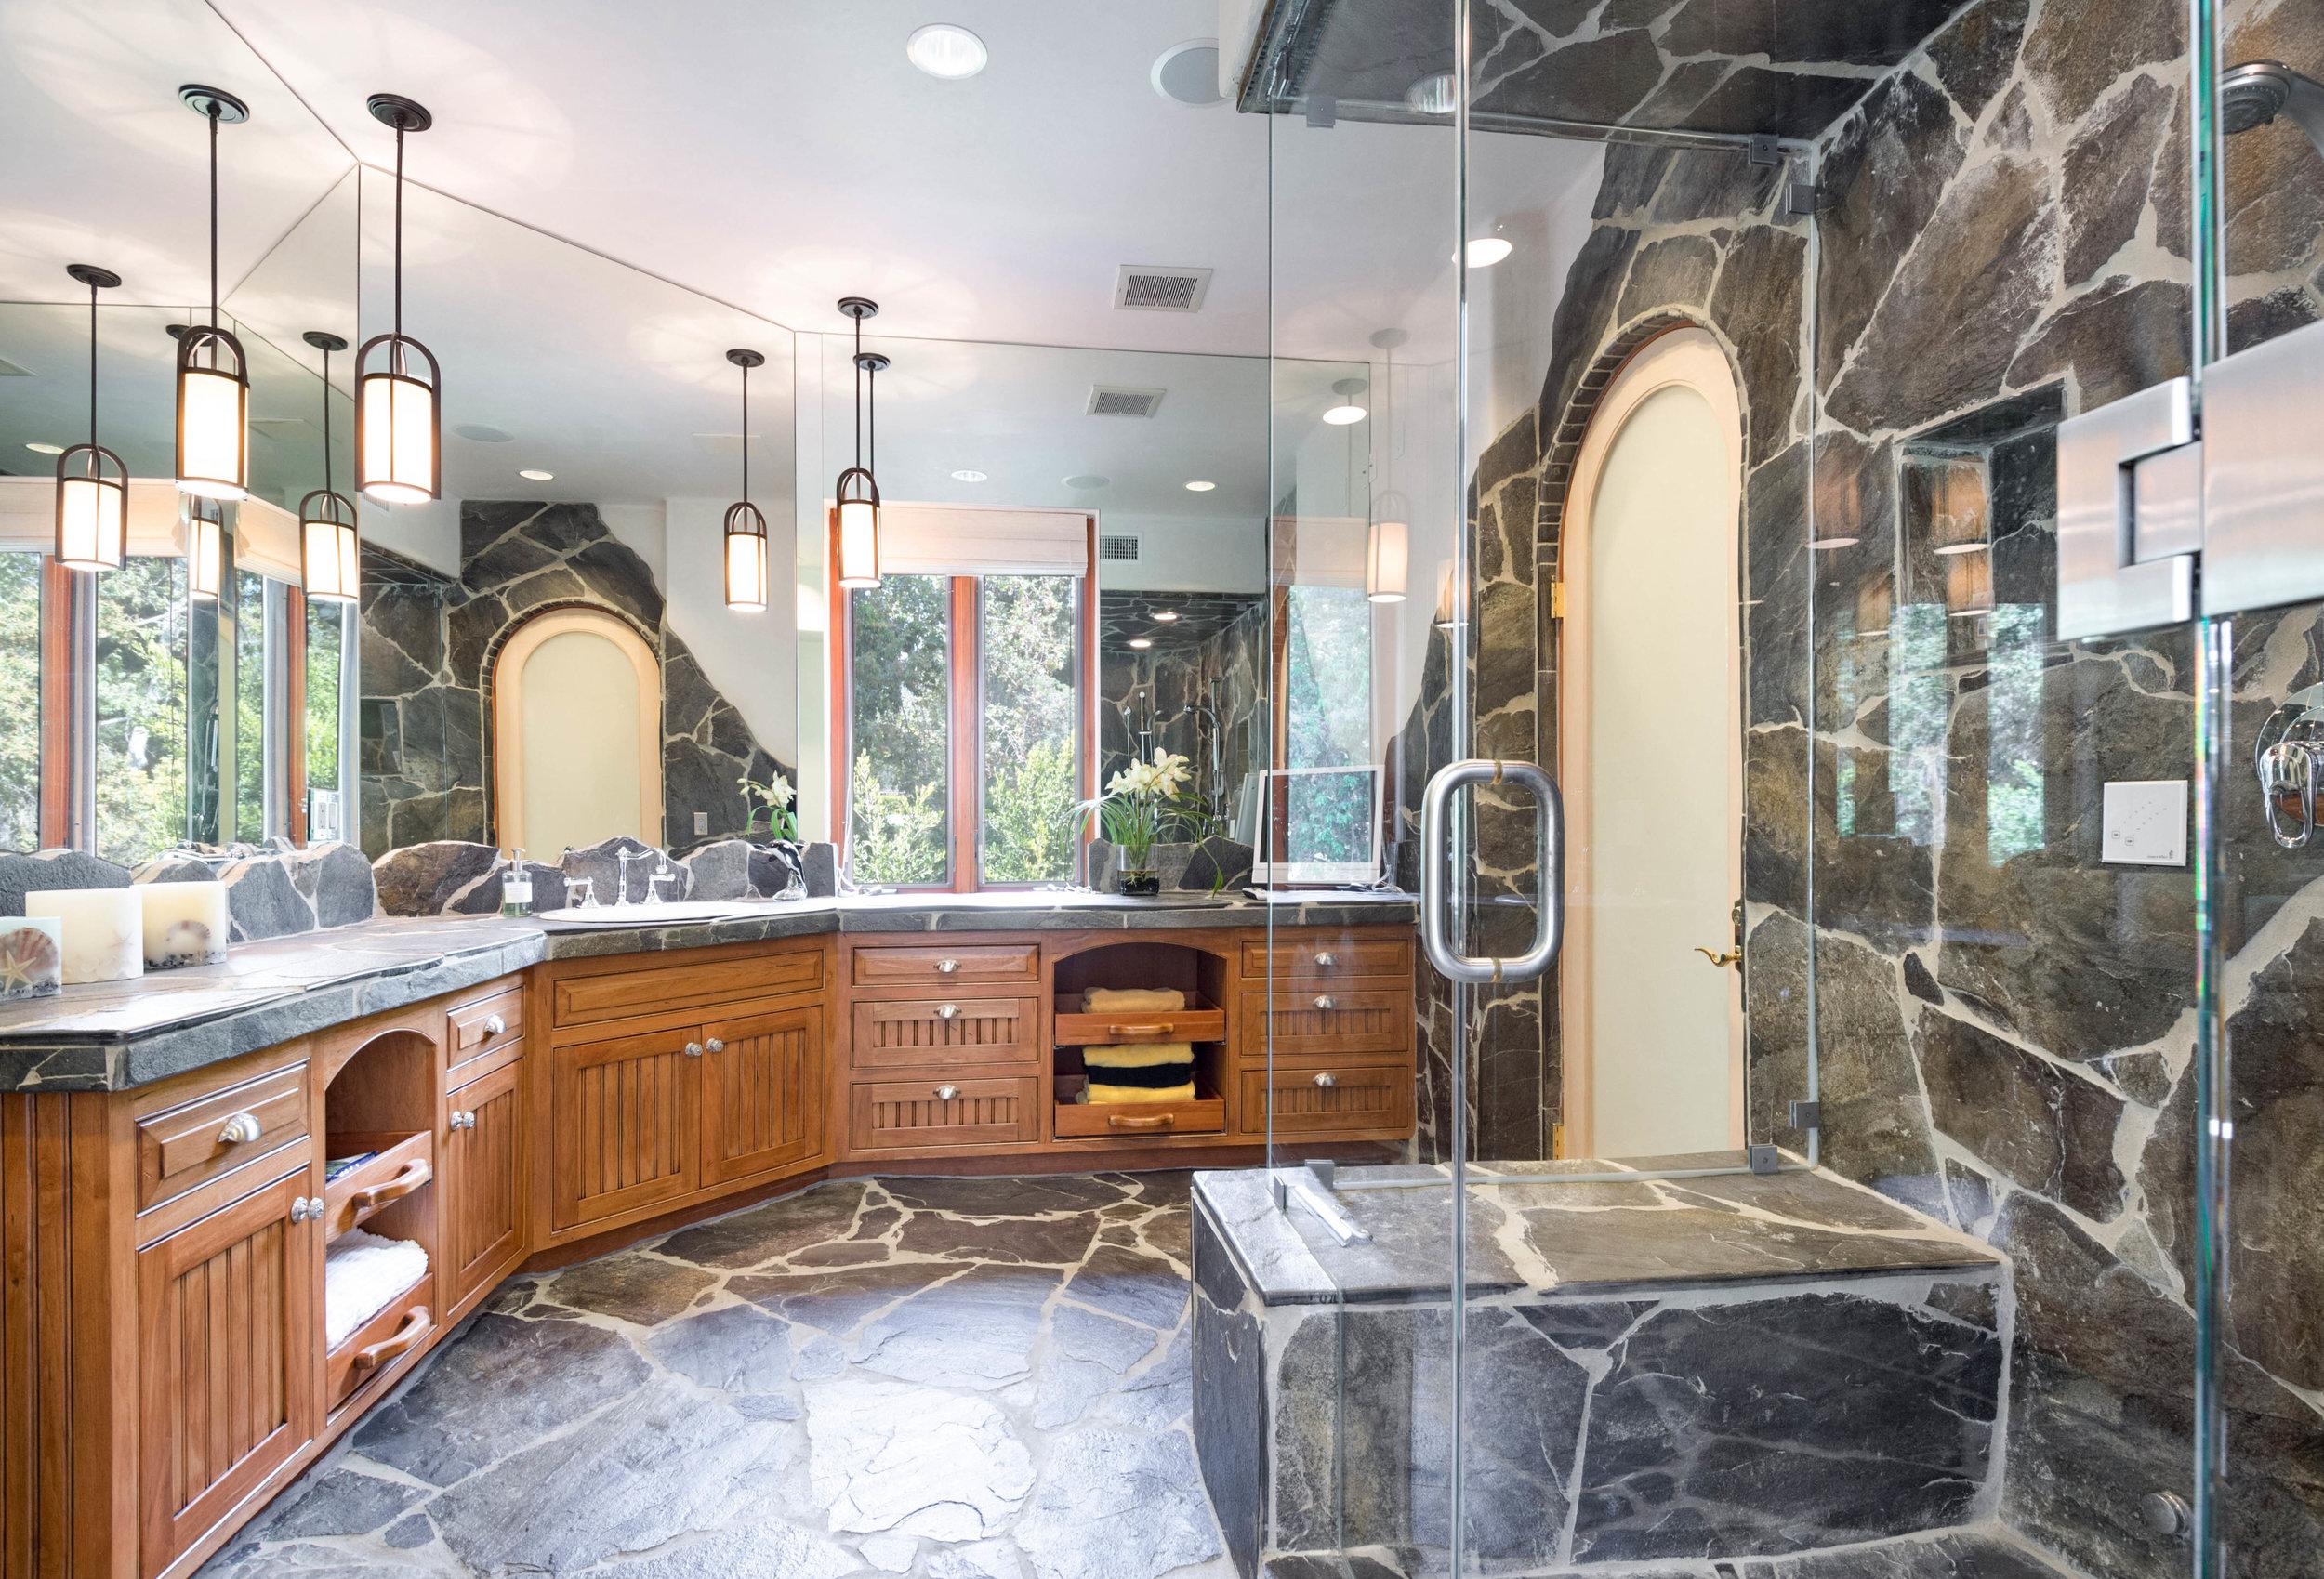 016 master bathroom 6405 bonsall Malibu For Sale The Malibu Life Team Luxury Real Estate.jpg